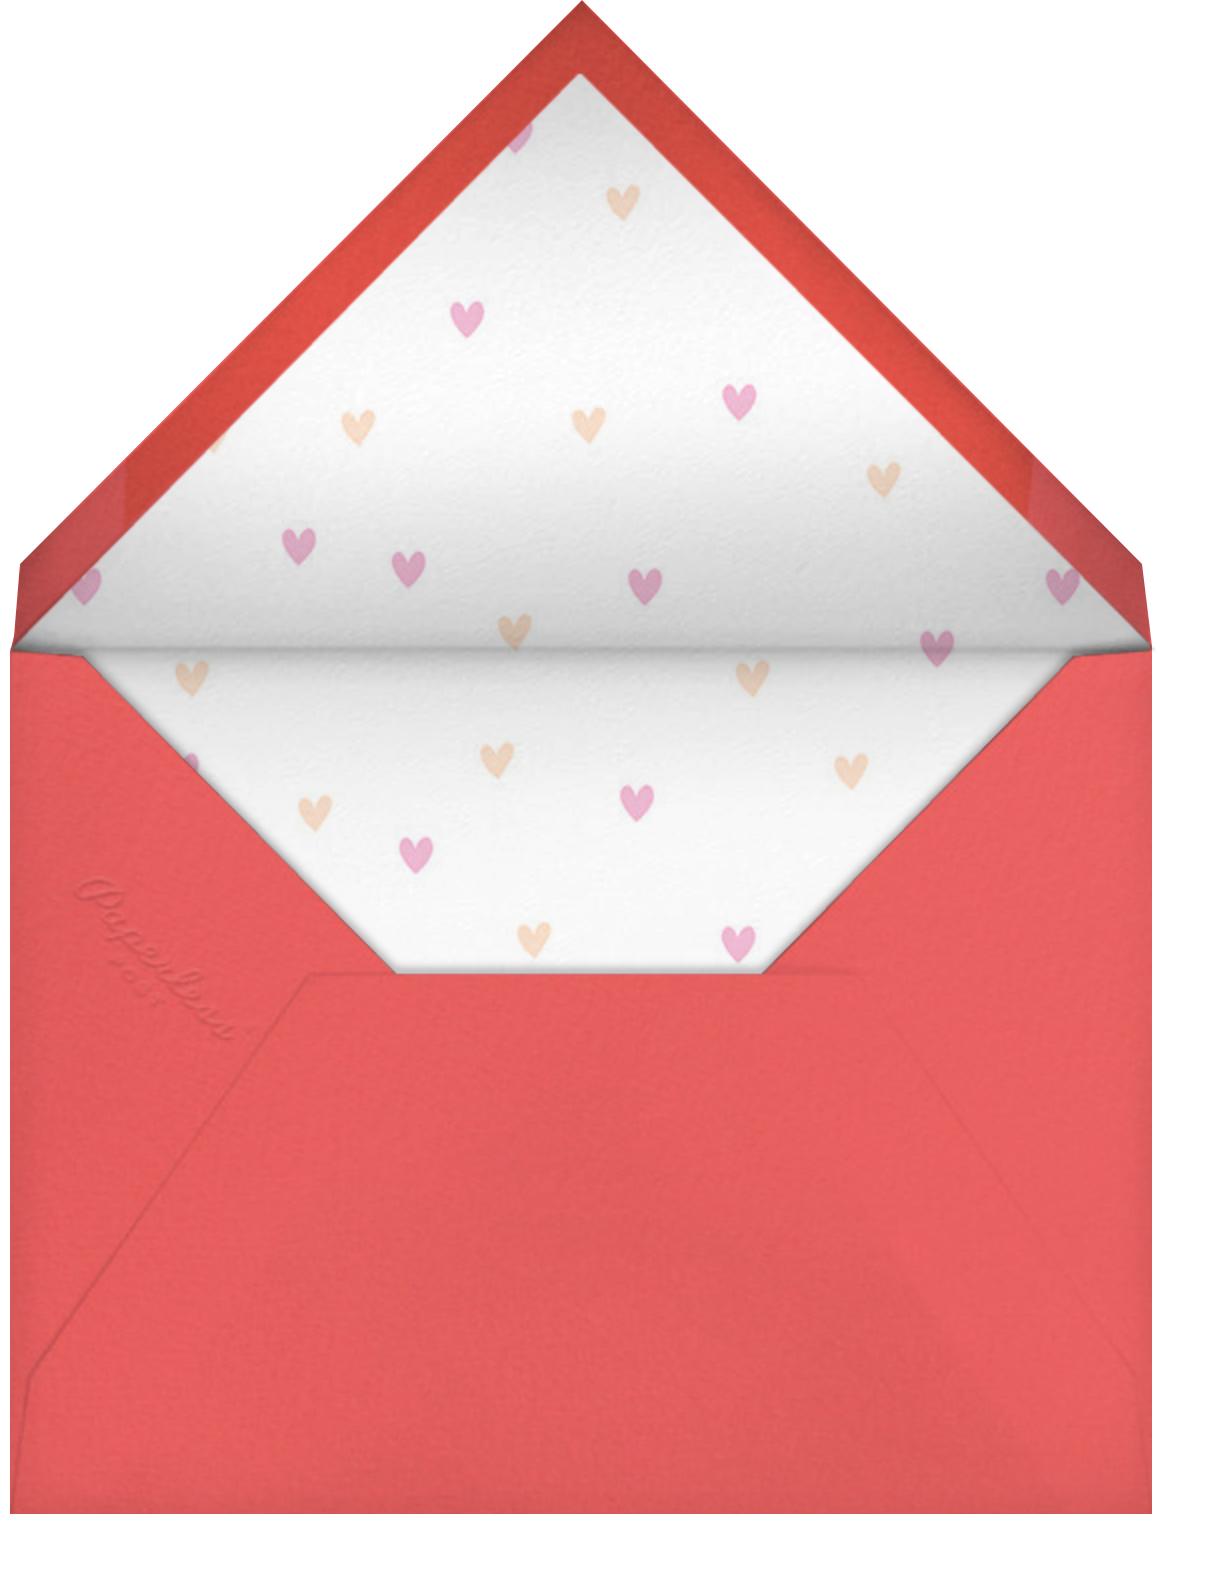 Birdie and Friends (Invitation) - Little Cube - Kids' birthday - envelope back